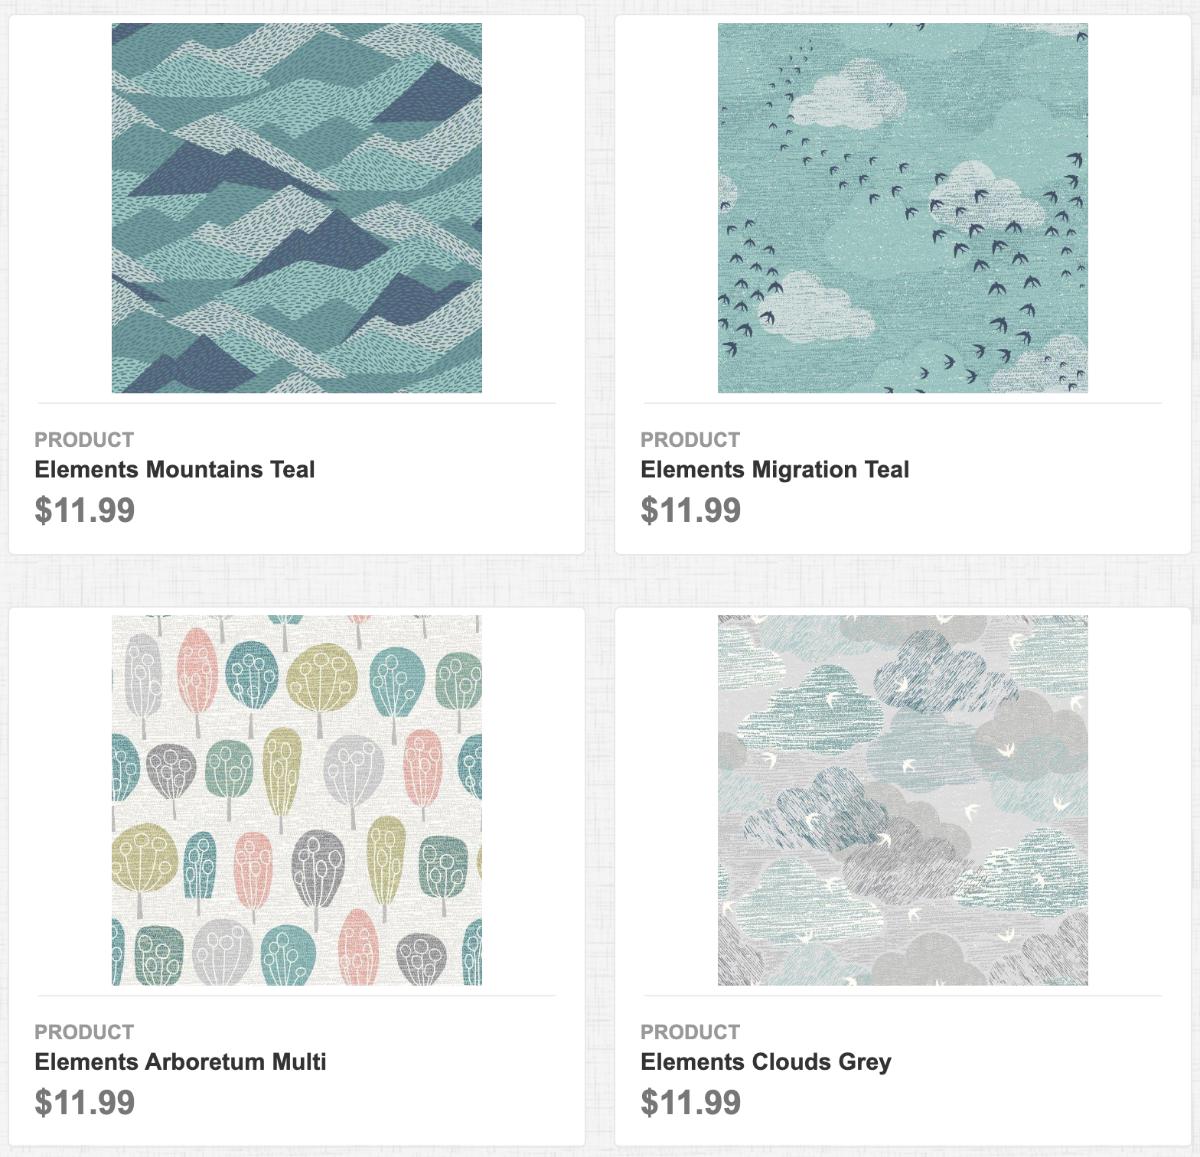 Elements: Mountains Teal, Migration Teal, Arboretum Multi, Clouds Grey